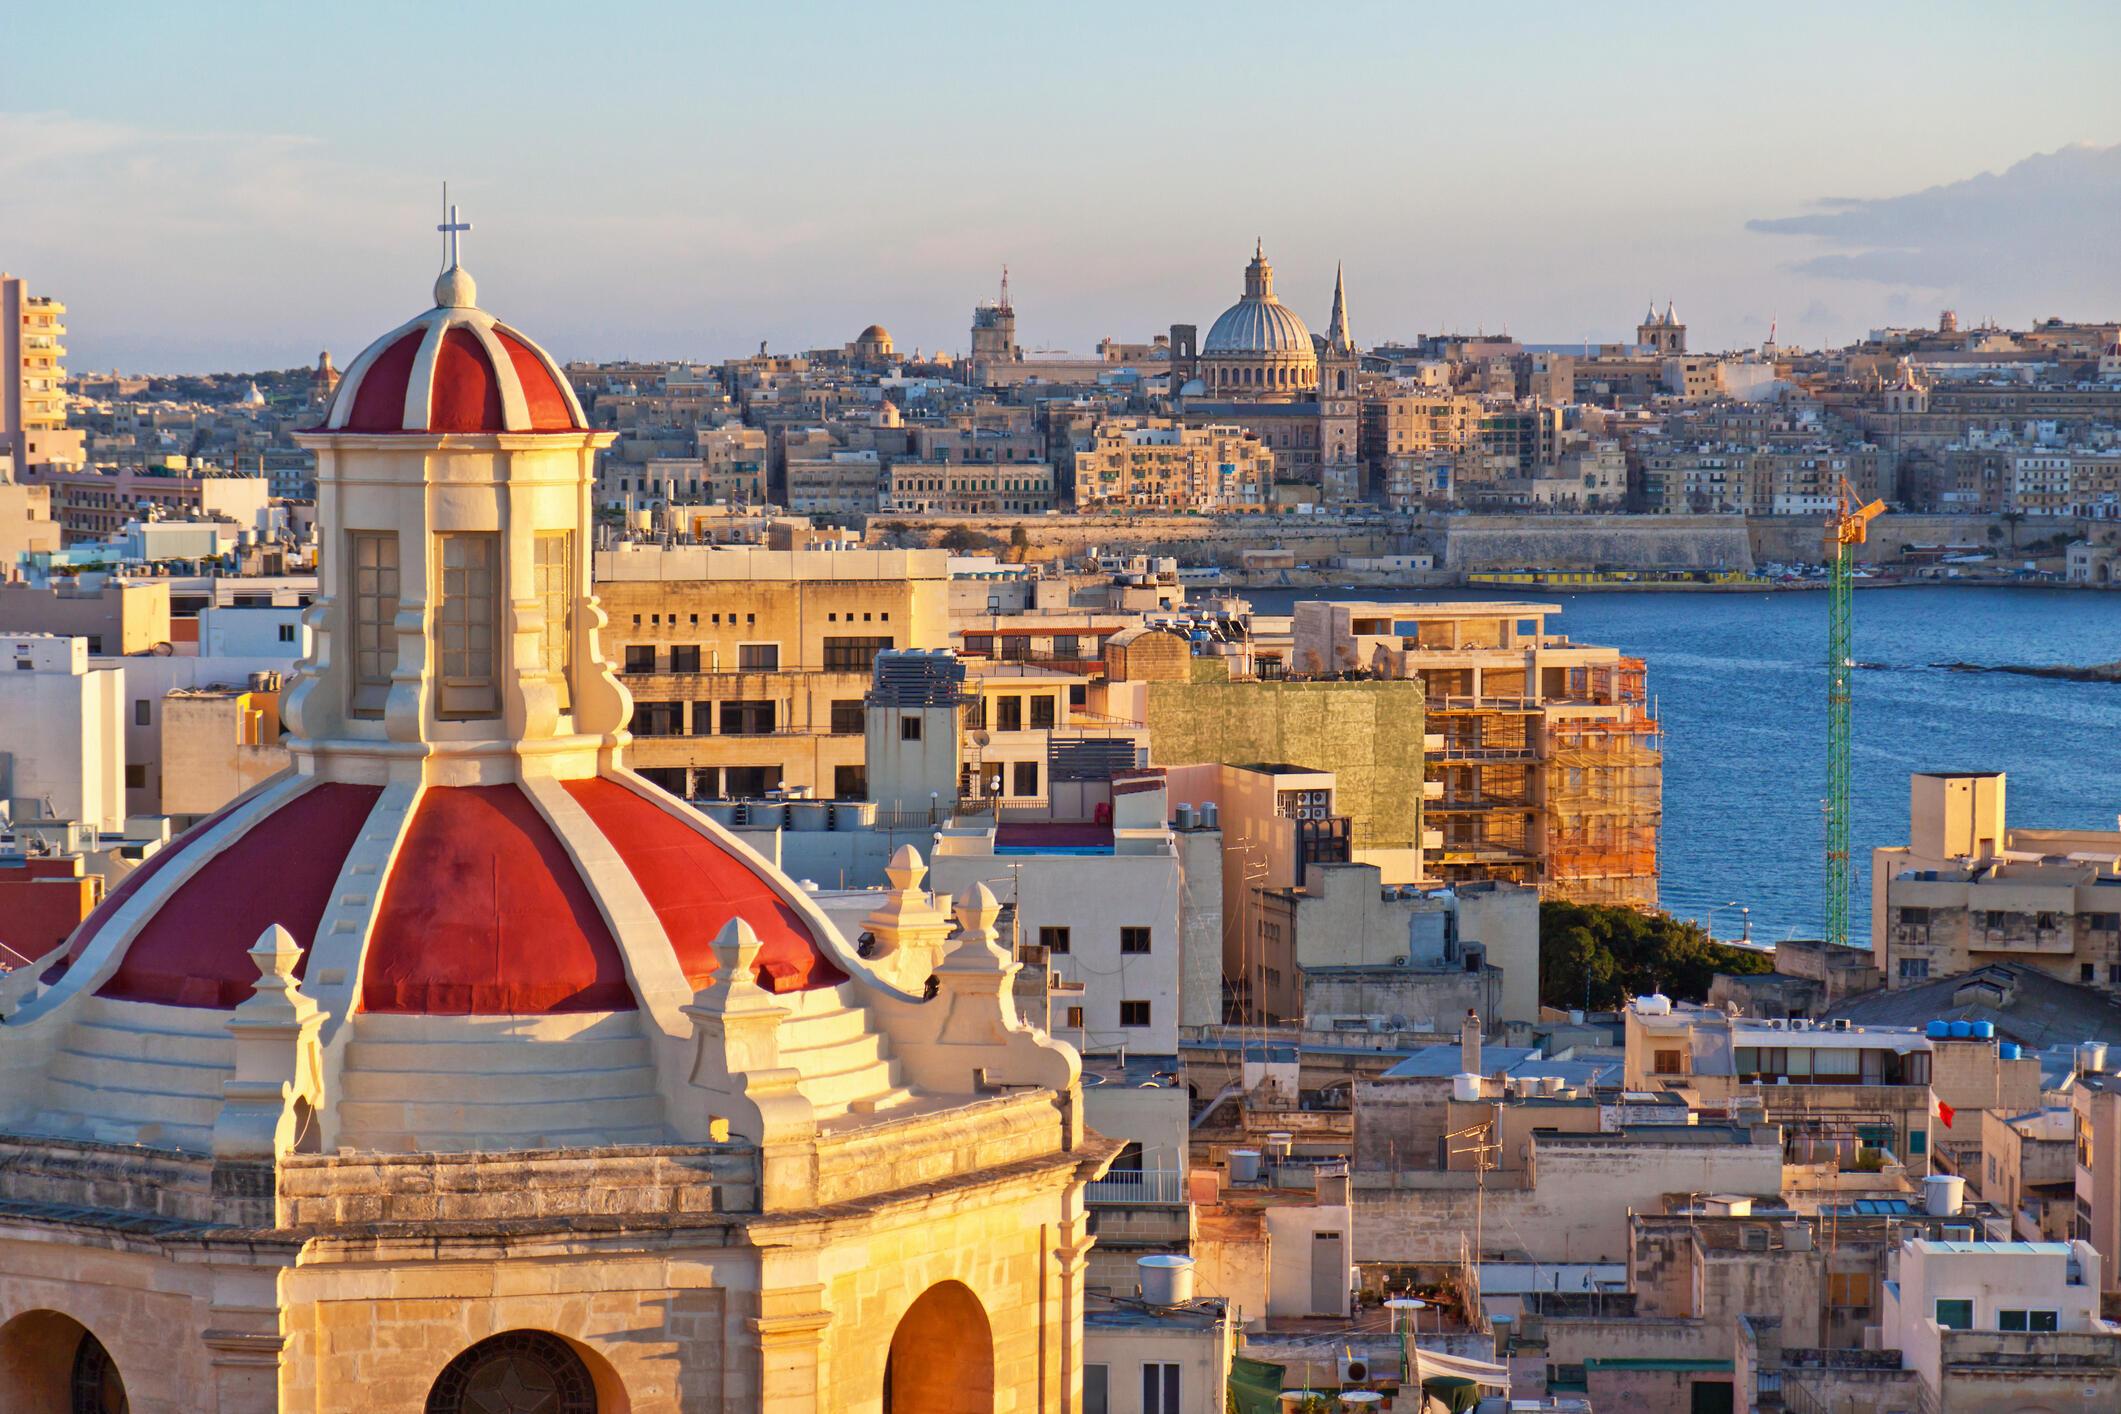 Vue de La Valette, capitale de Malte.